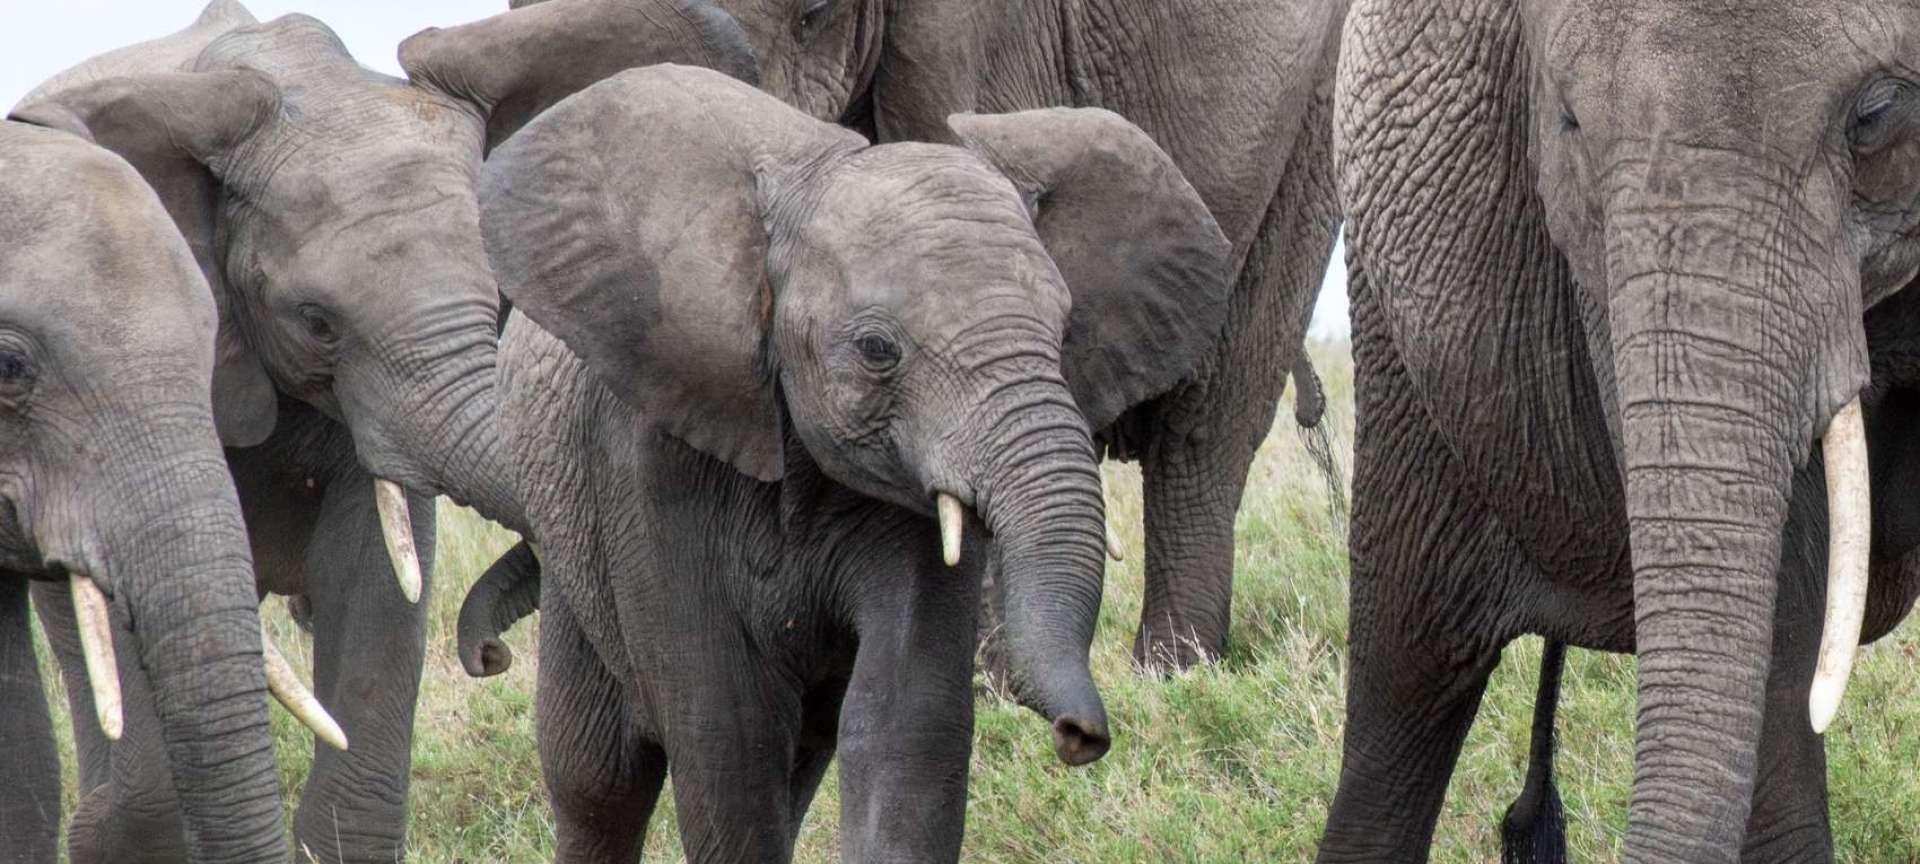 Big Five safaris in Africa - Africa Wildlife Safaris